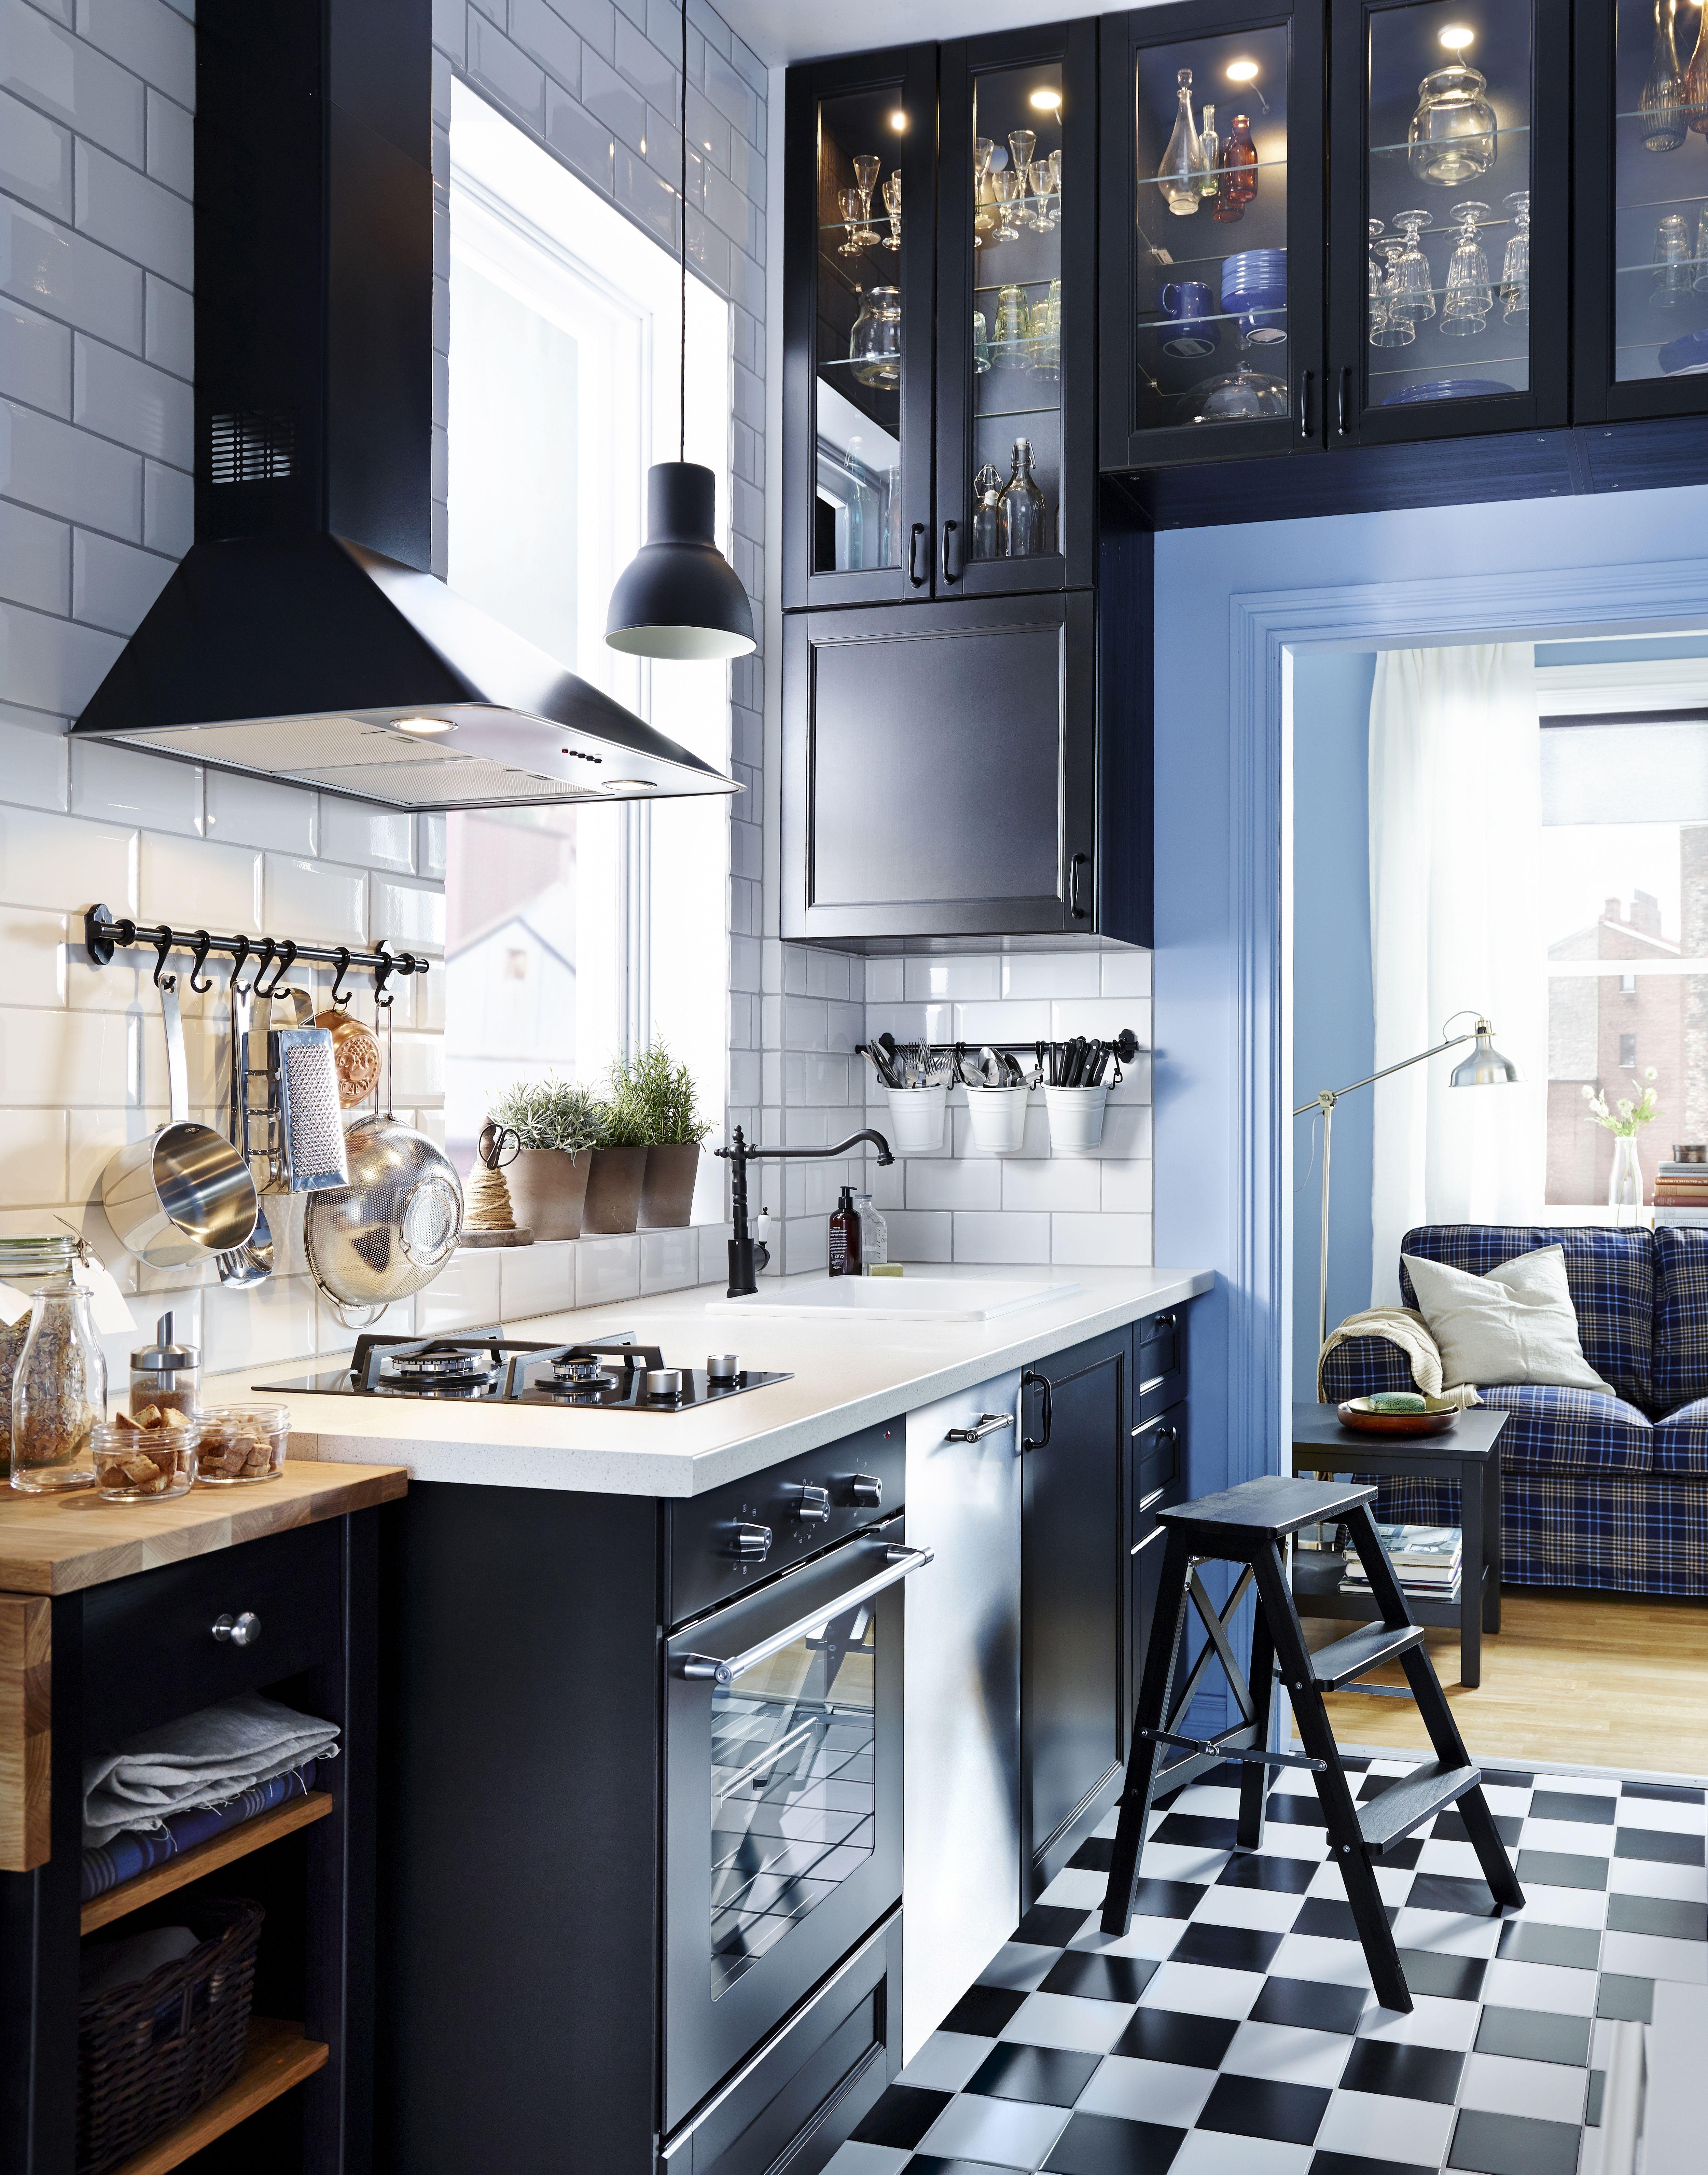 Ambienti Ikea Cucina piccole cucine per spazi ridotti - bella magazine